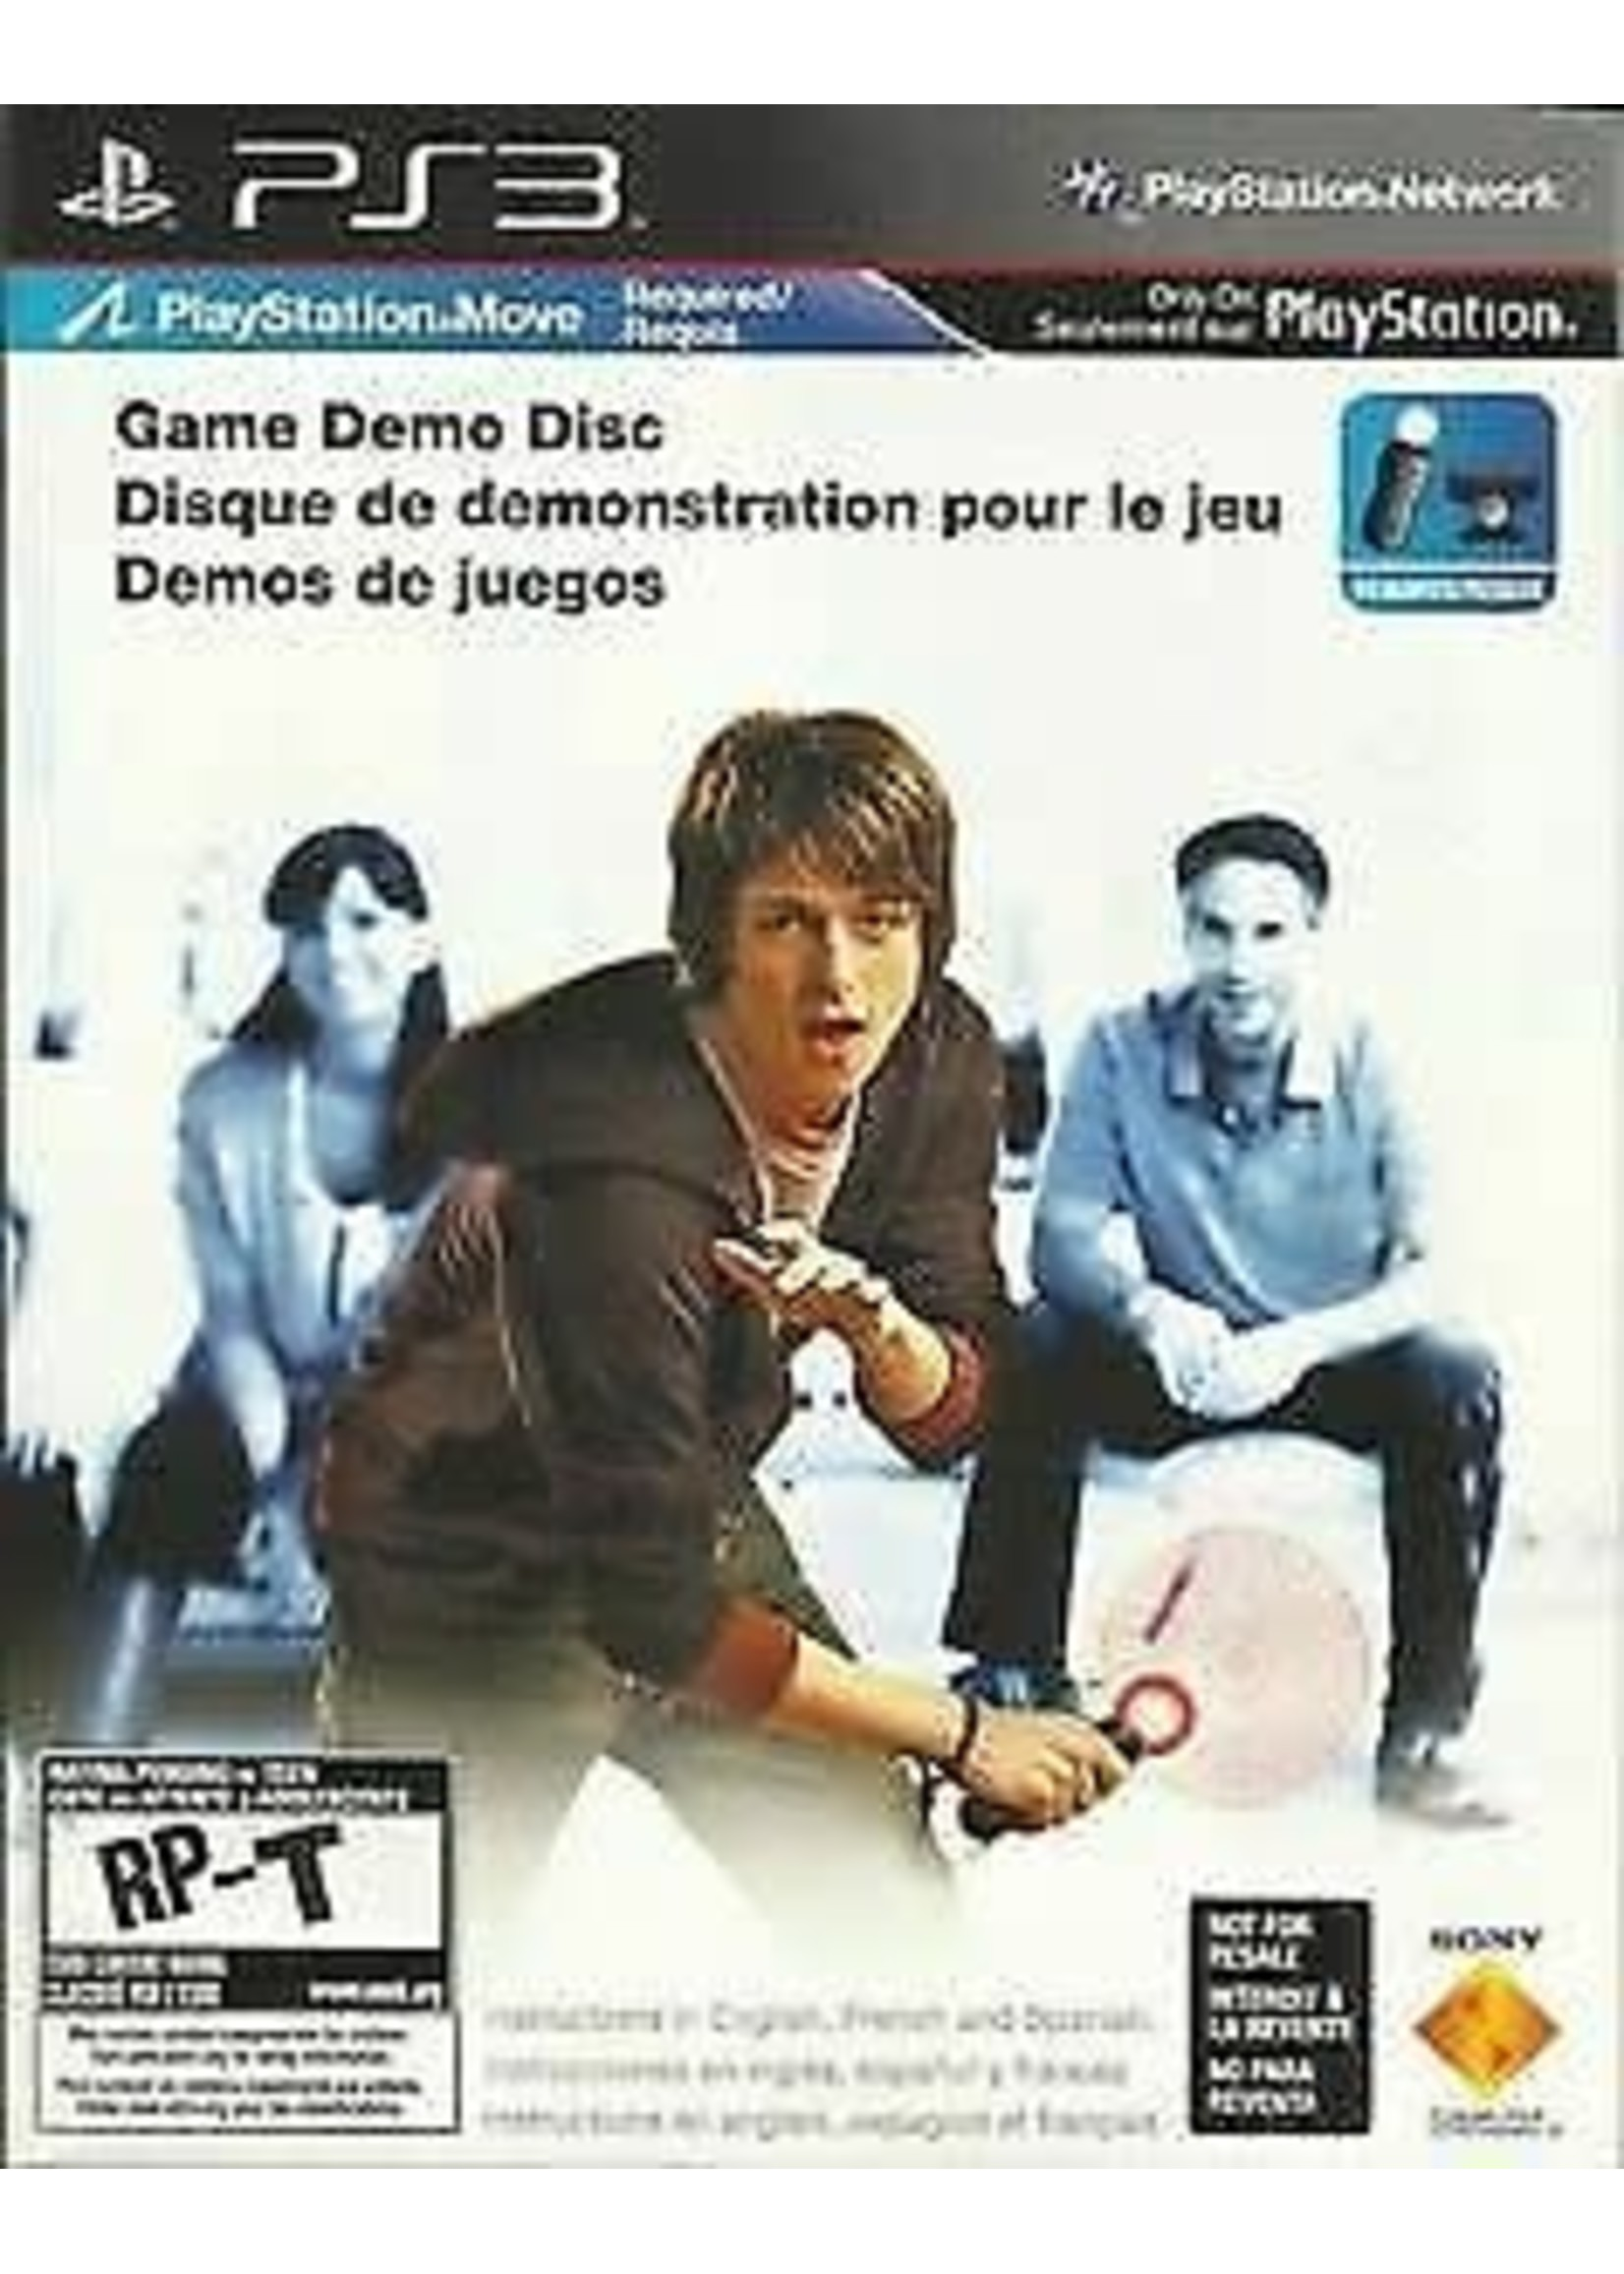 Ps3 Demo Disk Move